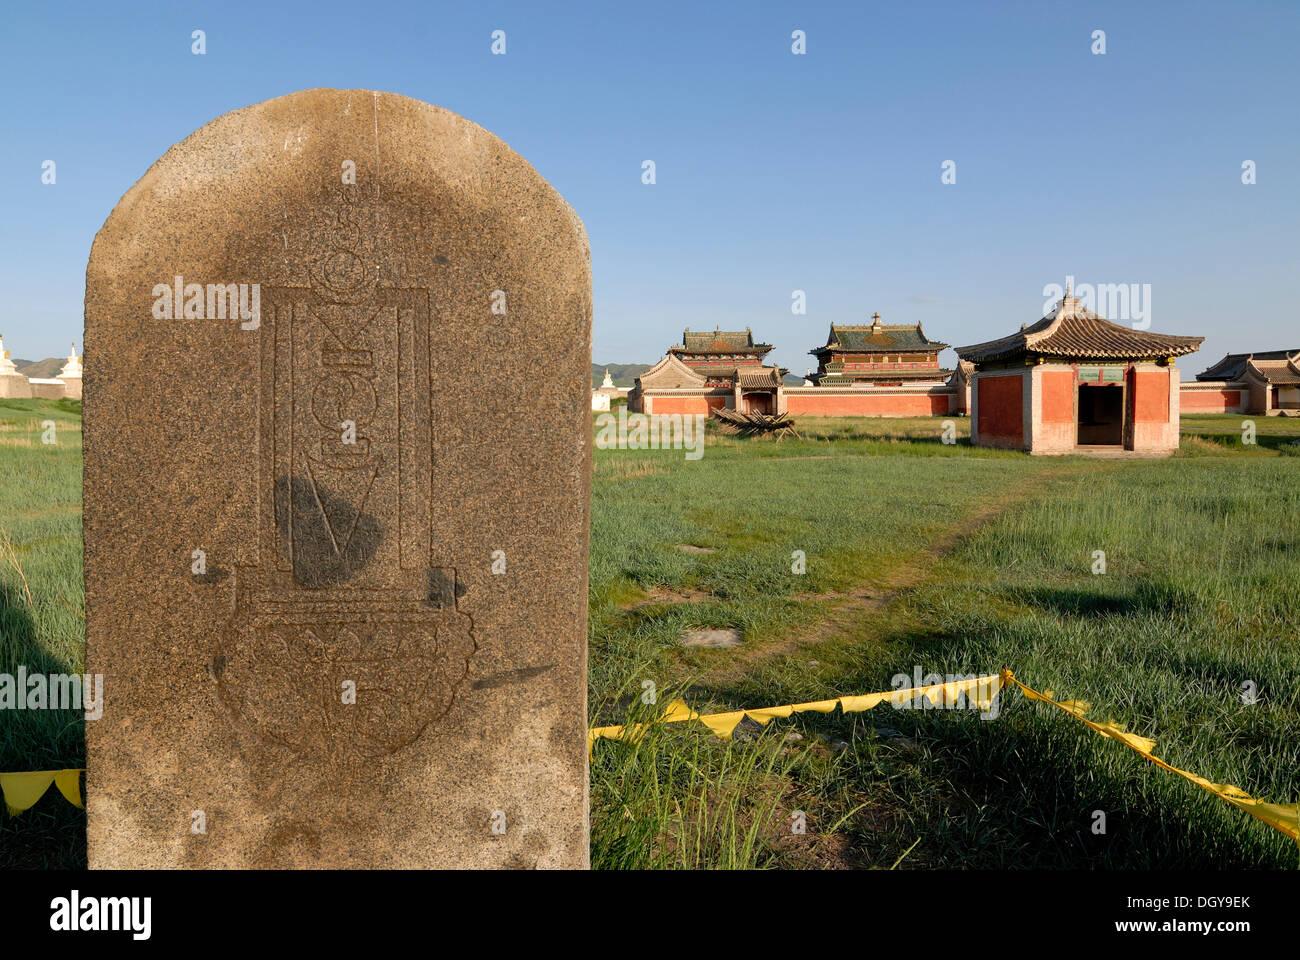 Temples and stone tablets of the Erdene Zuu Khiid Monastery, Karakorum, Kharkhorin, Oevoerkhangai province, Mongolia, Asia - Stock Image